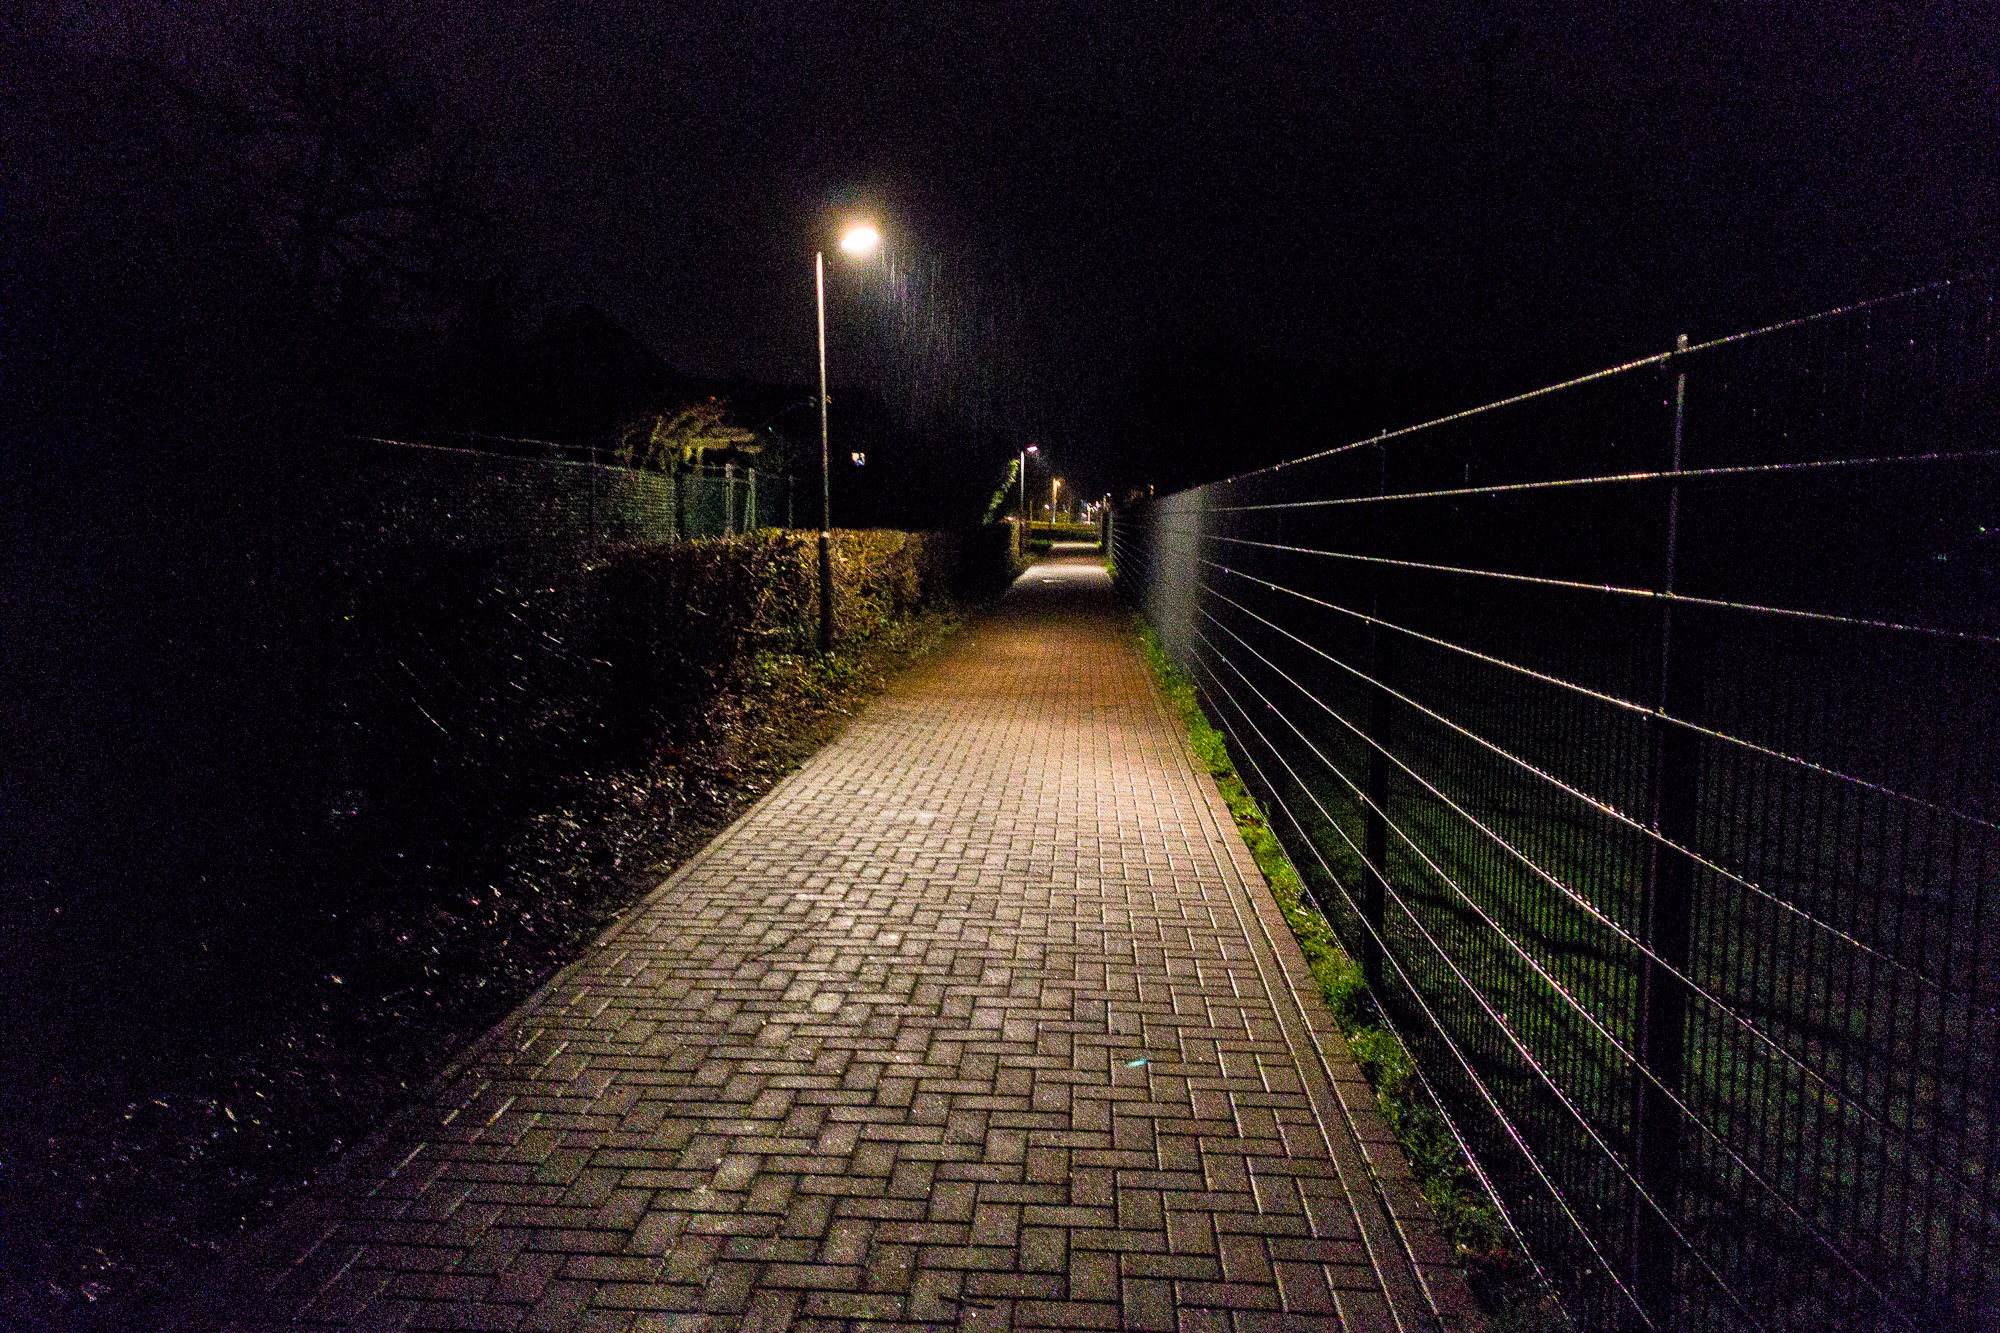 darkness in Bad Nenndorf